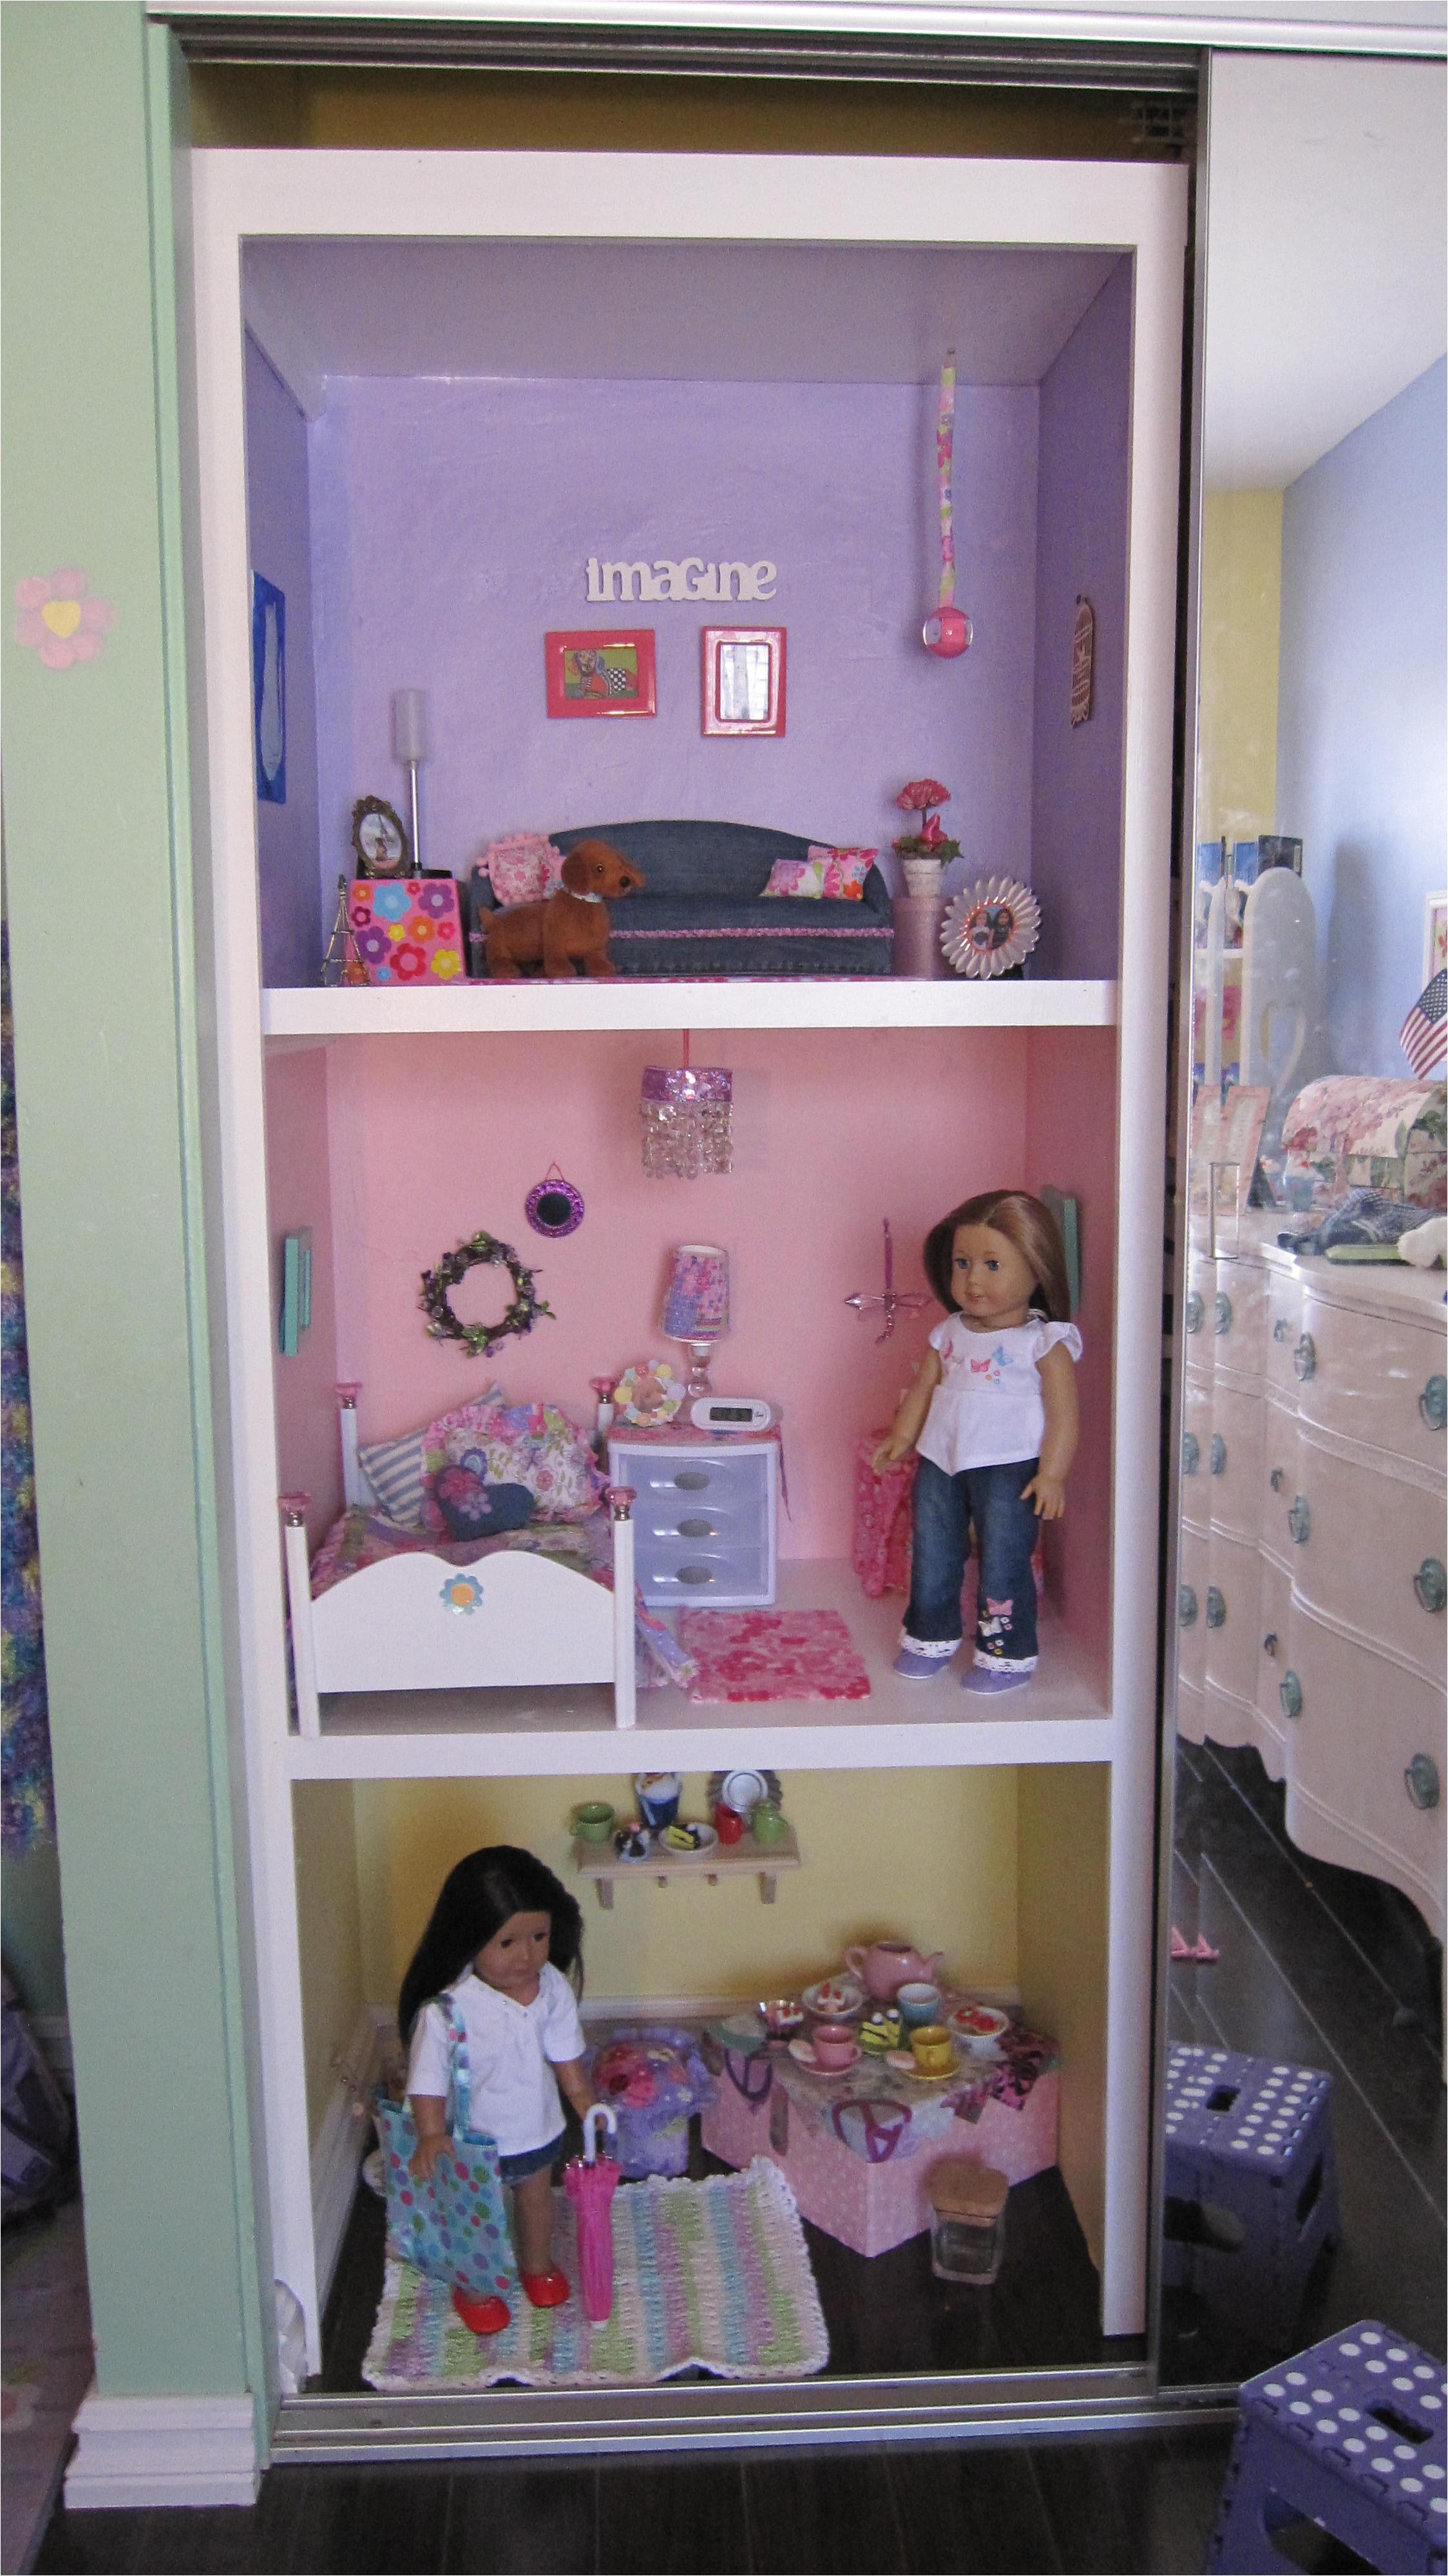 American Girl Doll House Plans Doll House Plans For American Girl